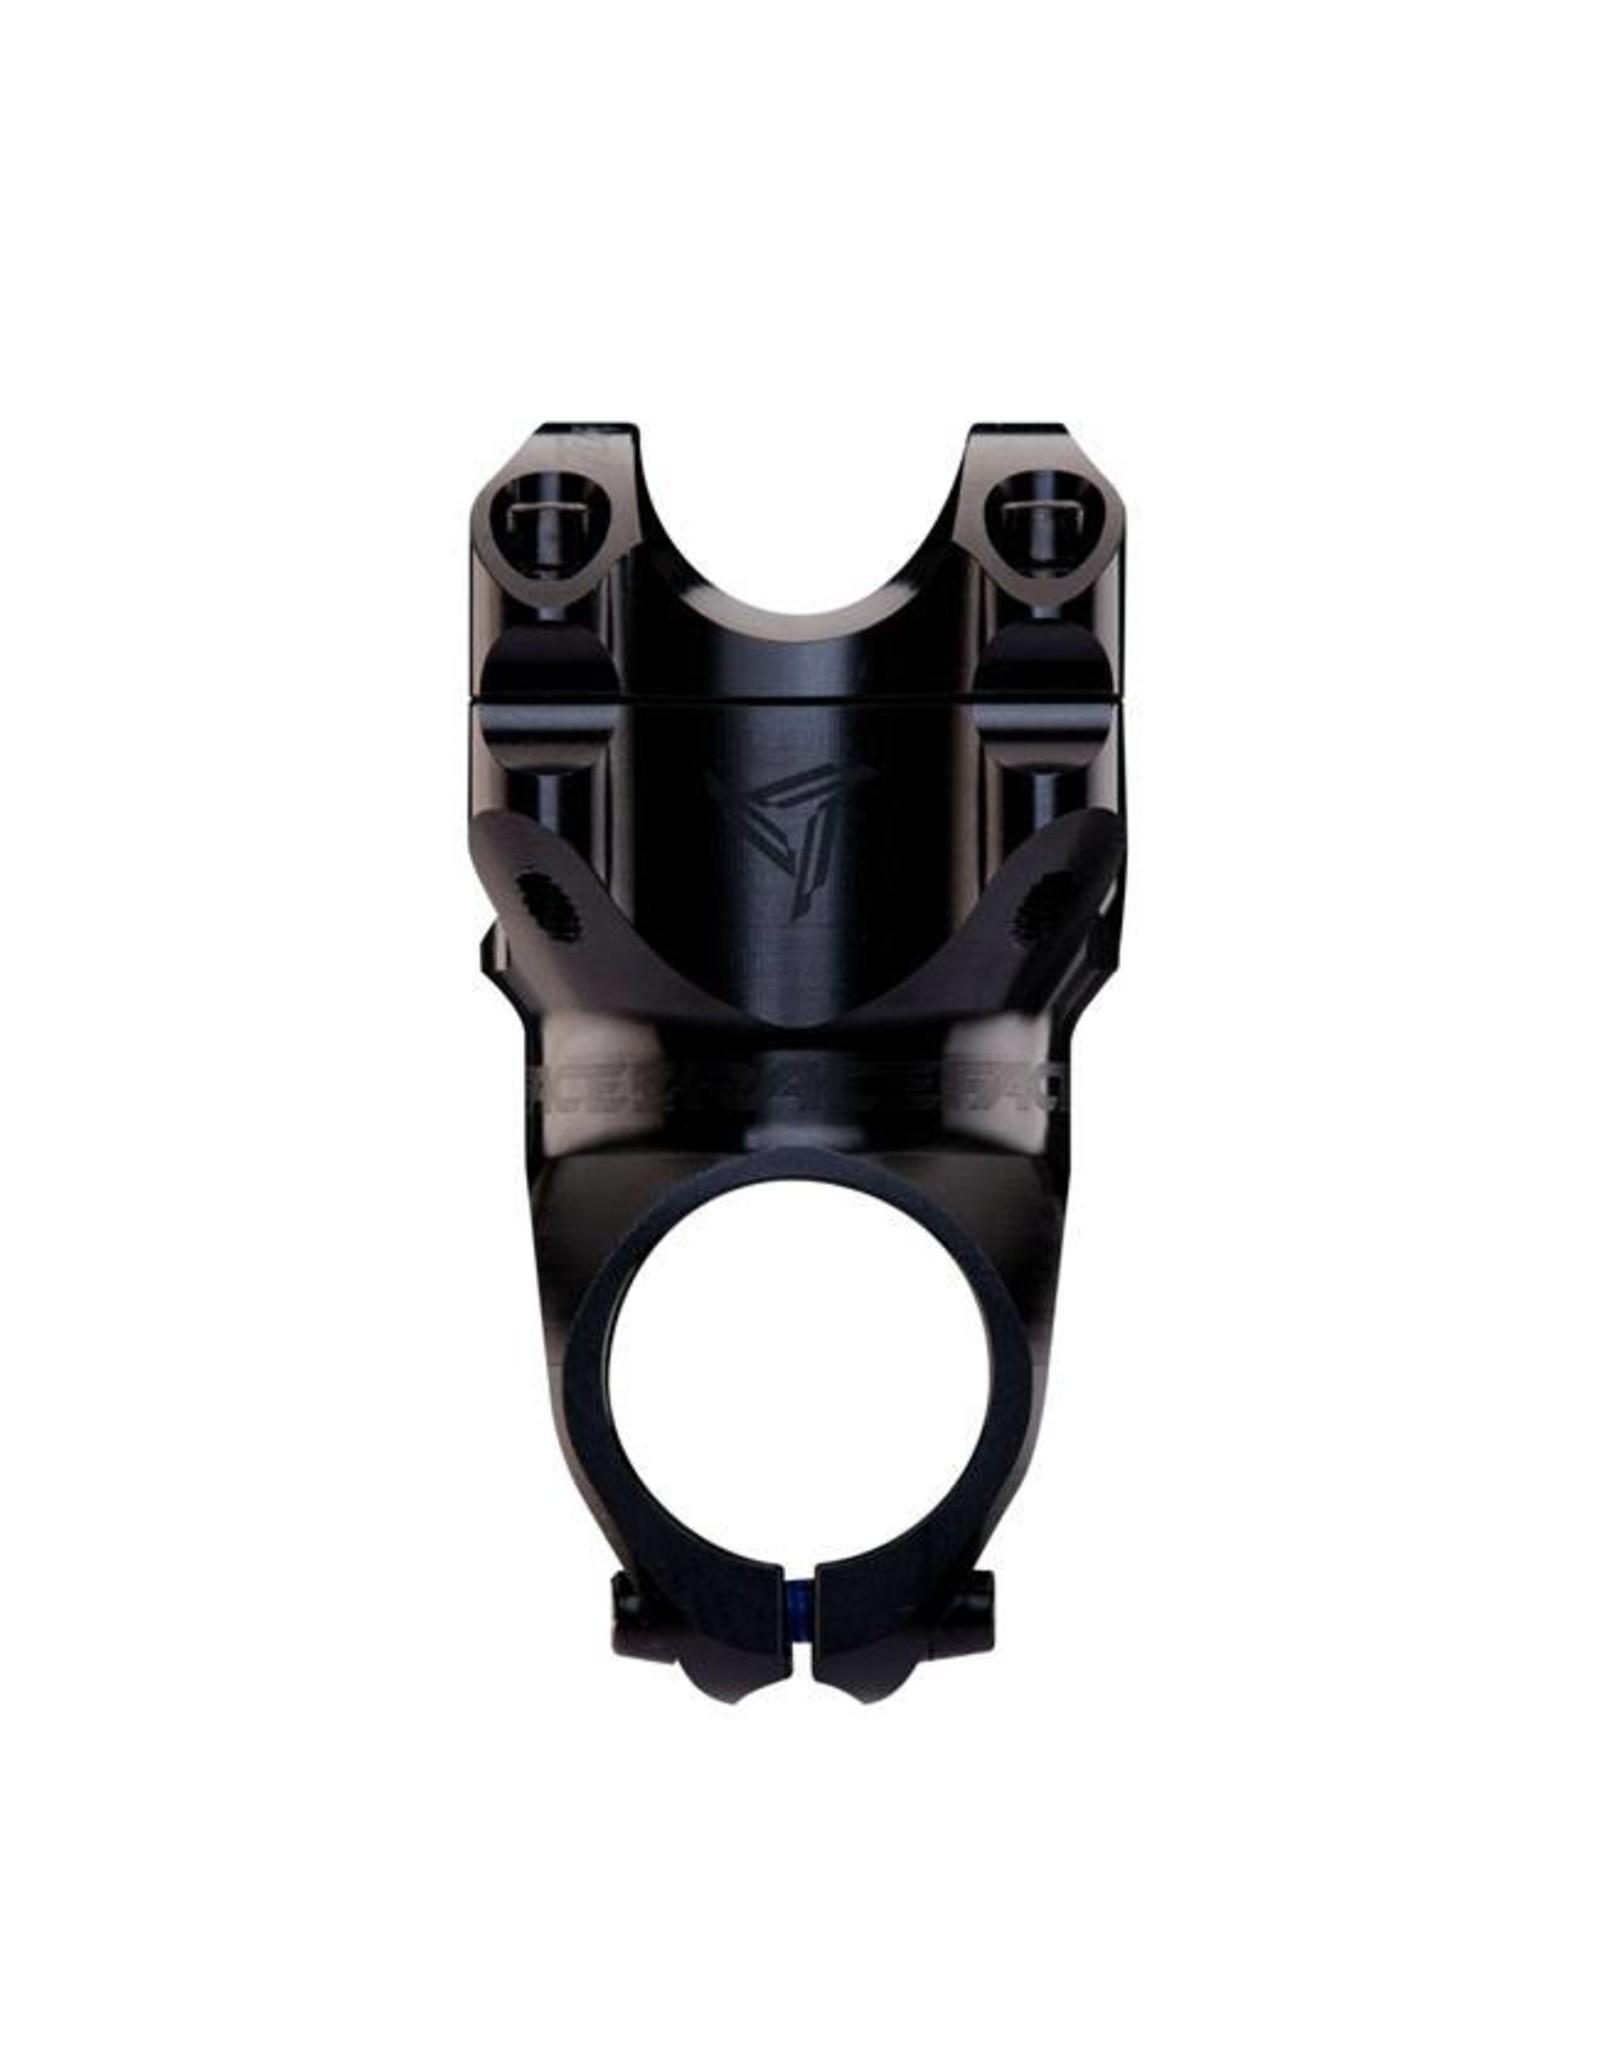 RaceFace RaceFace Turbine R 35 Stem: 40mm x 35 +/- 0 degree, Black